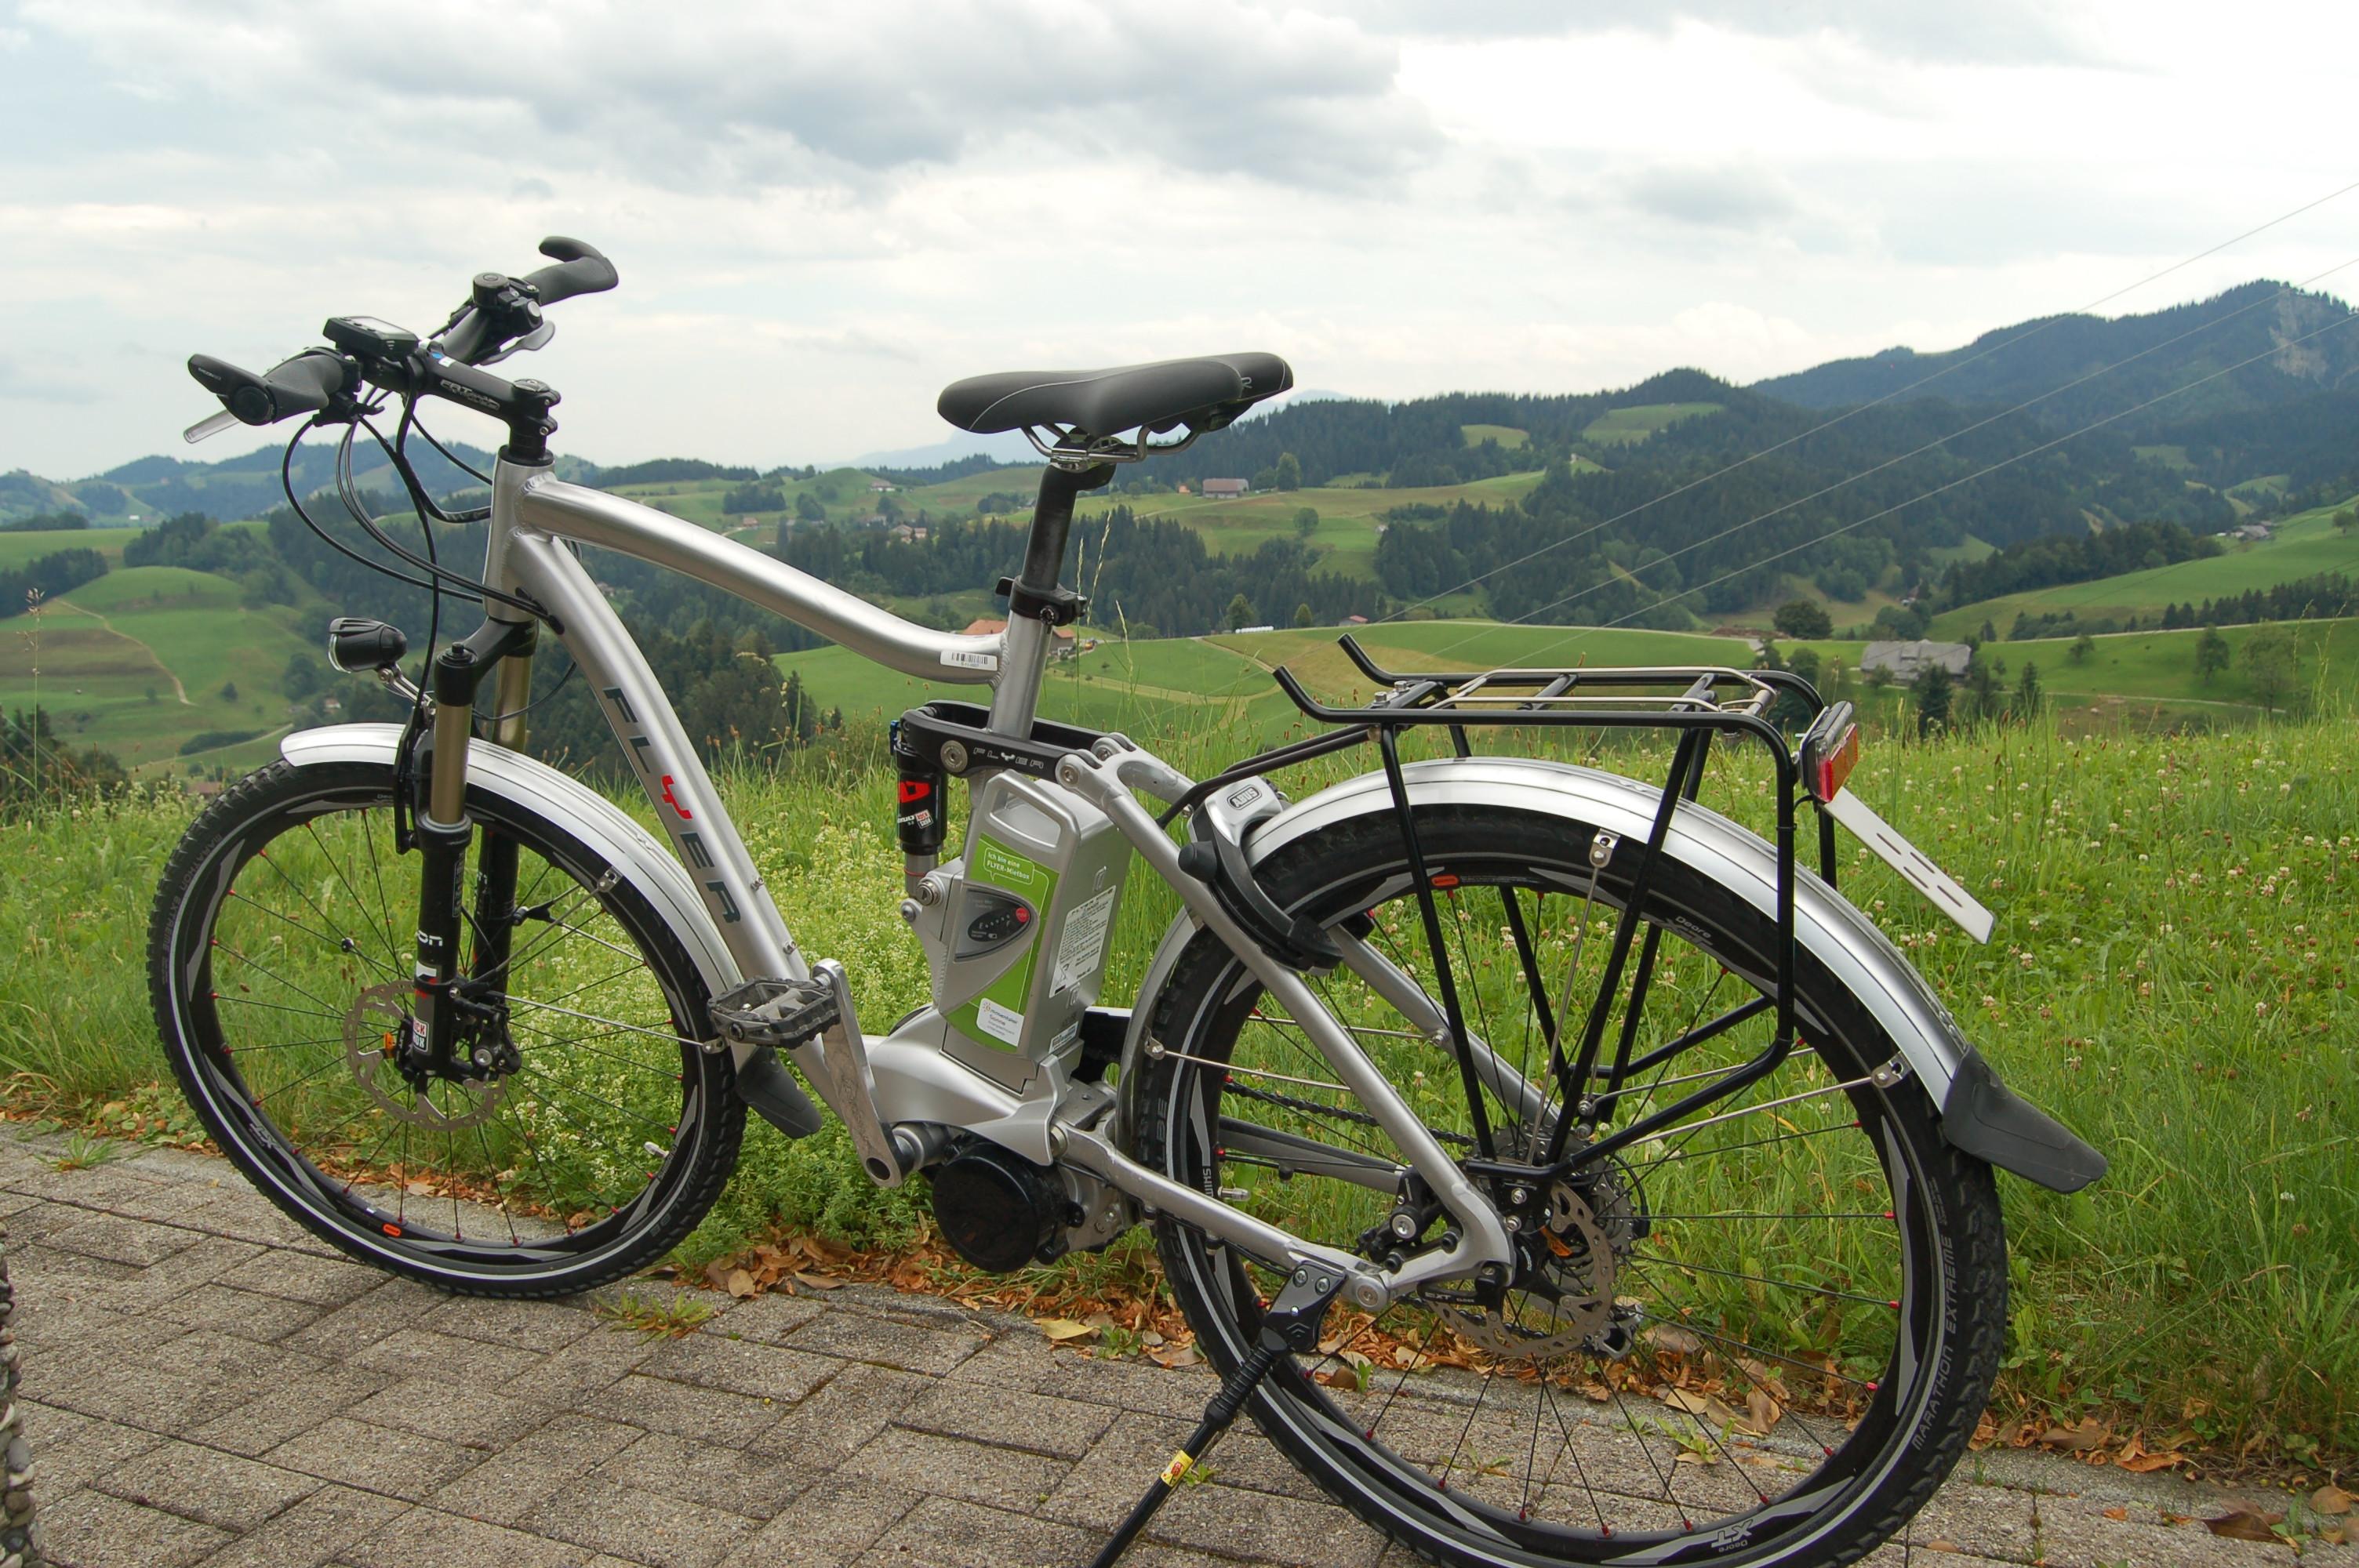 Swiss E Bike Maker Takes On Financial Partner Bicycle Retailer